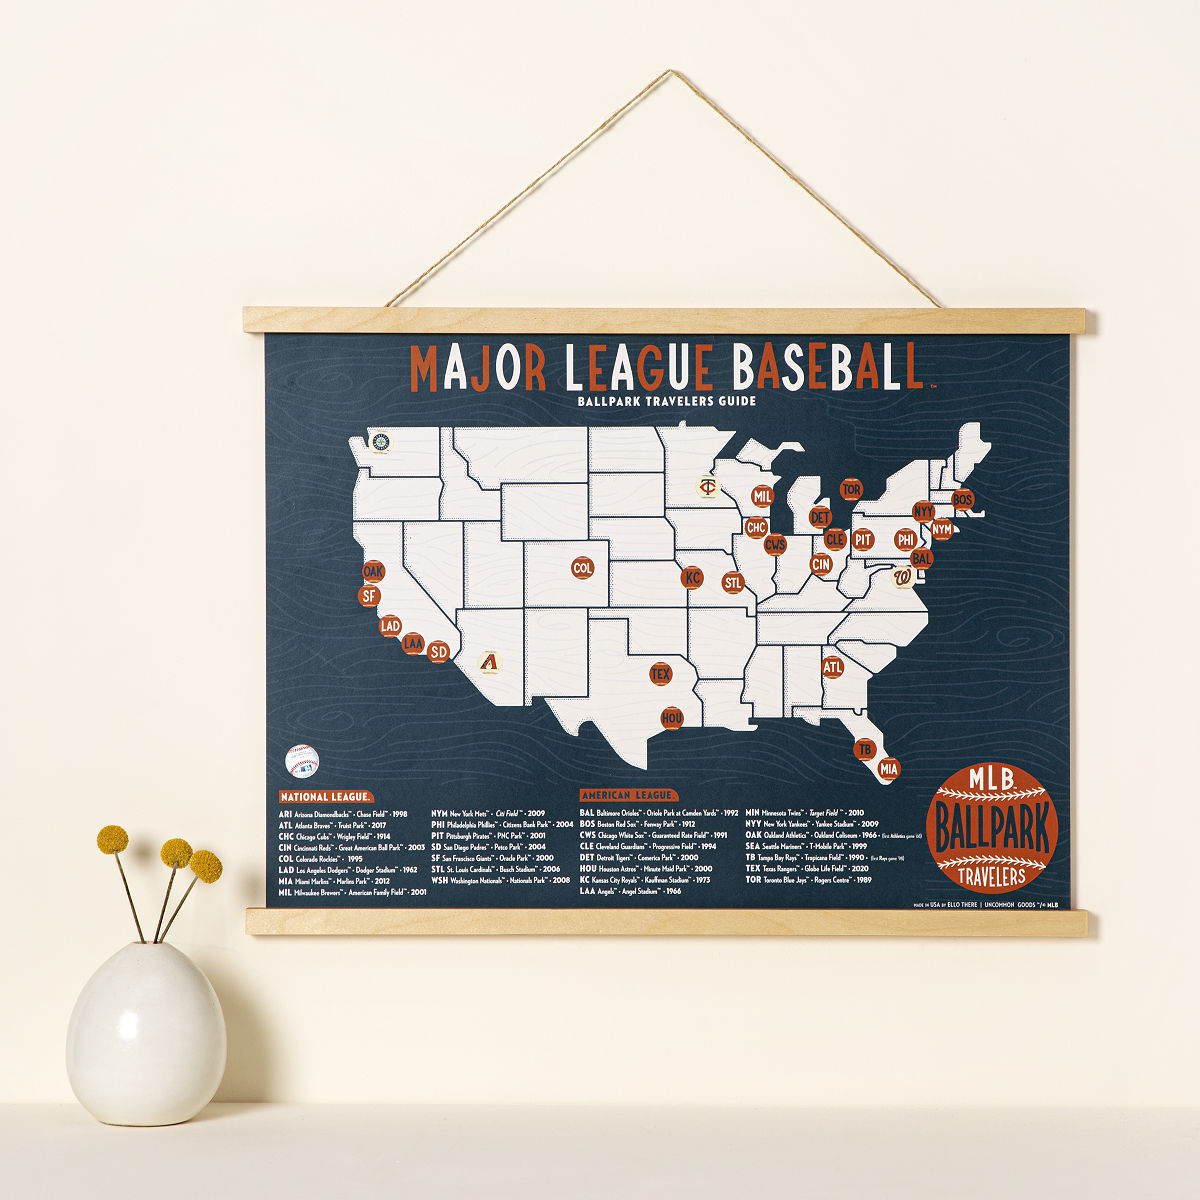 Mlb Ballpark Travelers Map Ball Fields Sports Uncommongoods - Map-of-us-baseball-stadiums